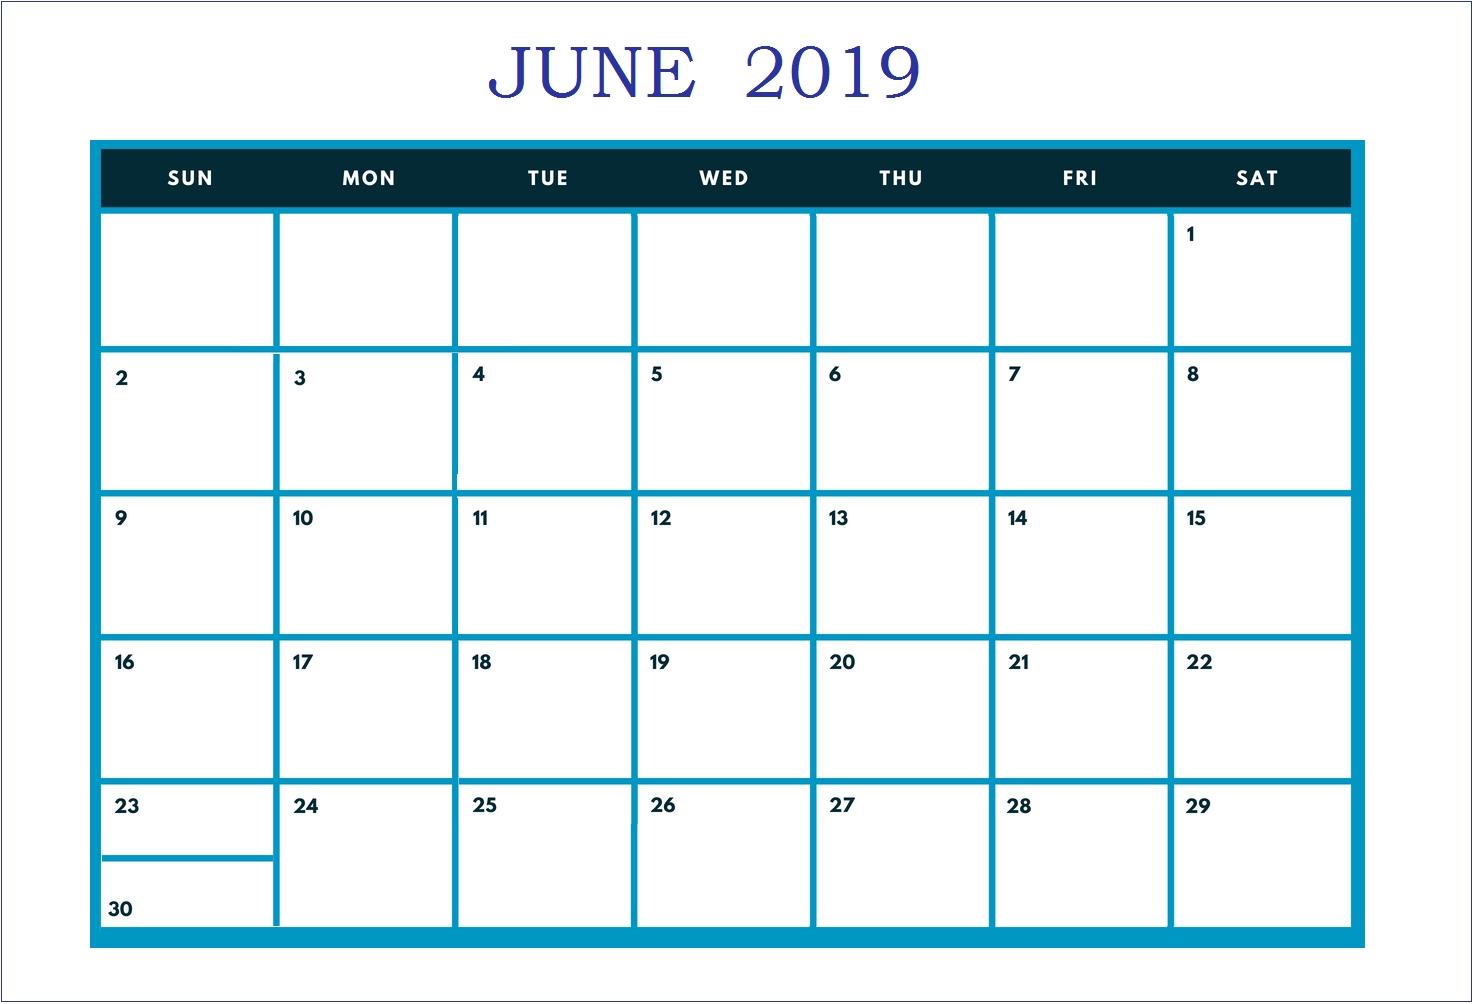 June 2019 Calendar | Monthly Calendar Templates | June 2019-Monthly Schdule For June